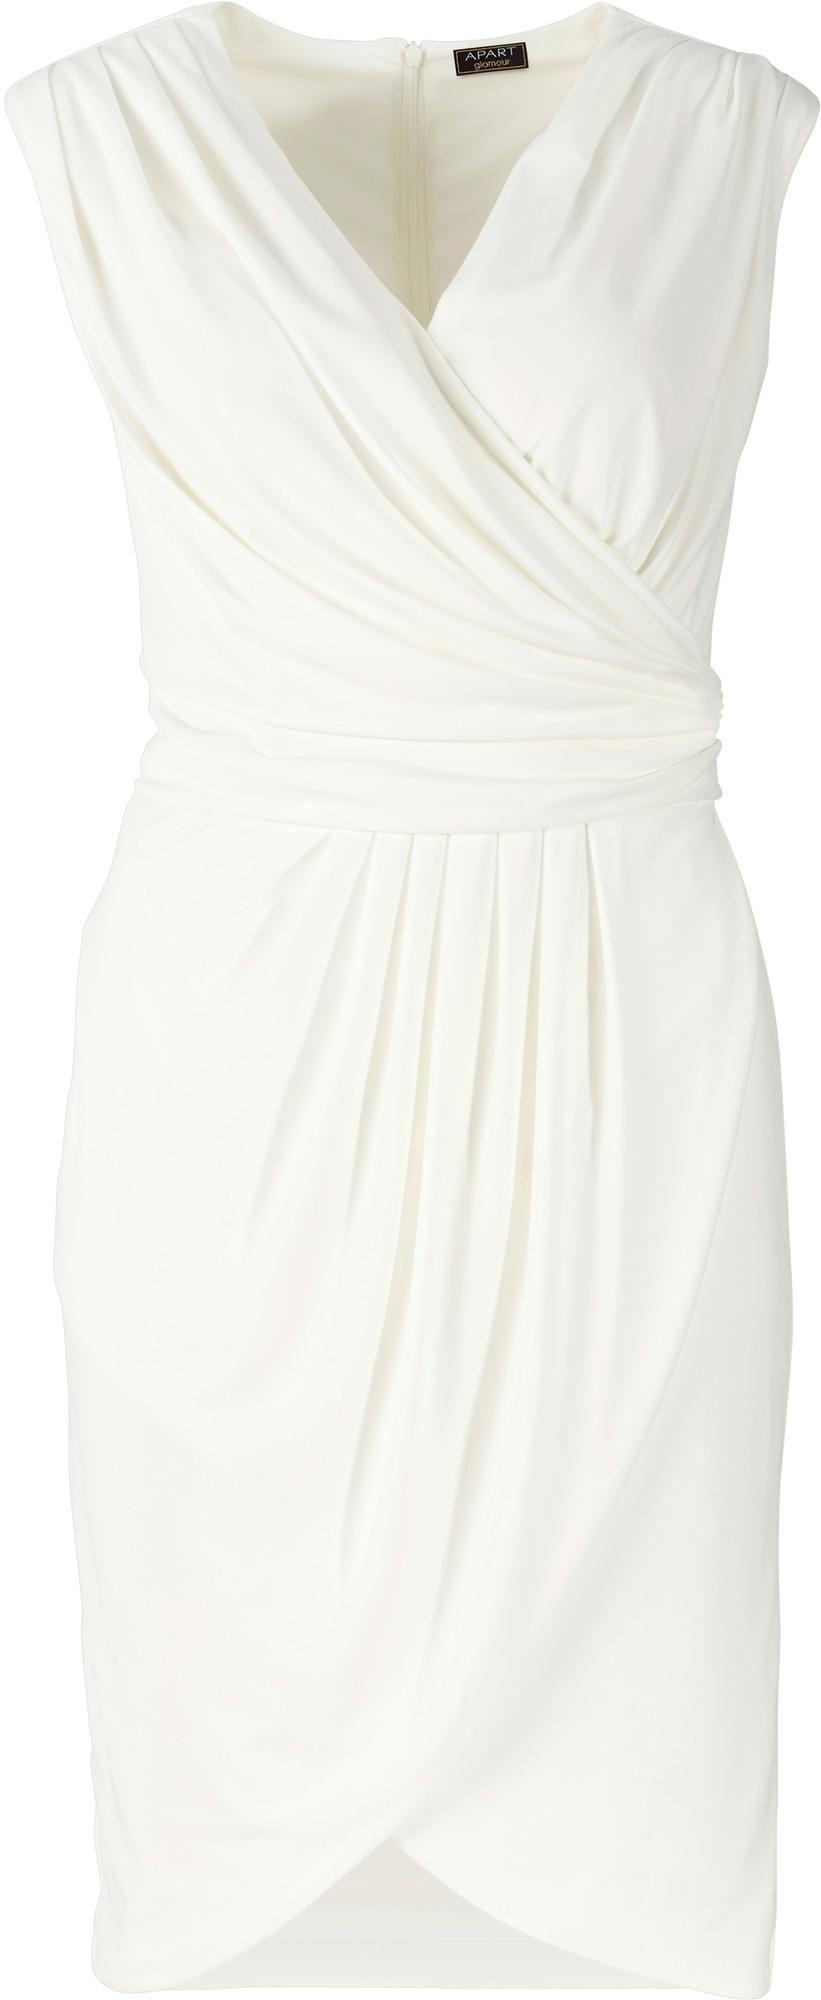 Elegantes Kleid fürs Standesamt. Brautkleid, Wickeloptik, Elegant ...